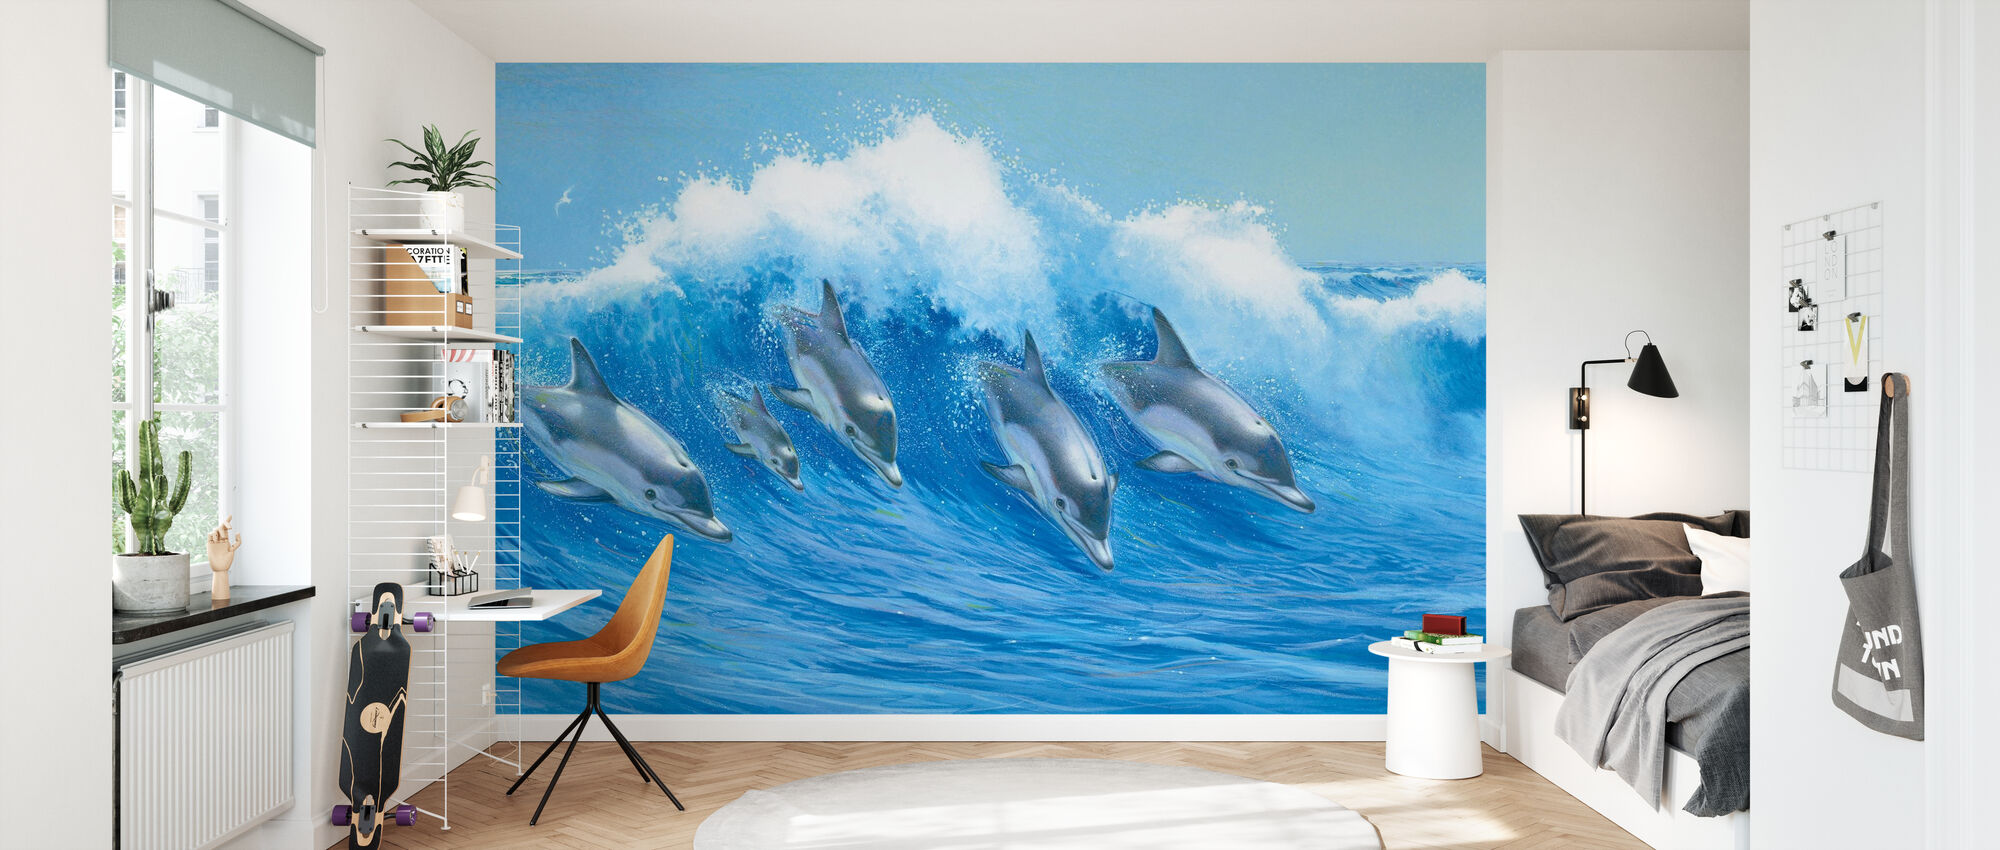 Dolfijnen springen - Behang - Kinderkamer